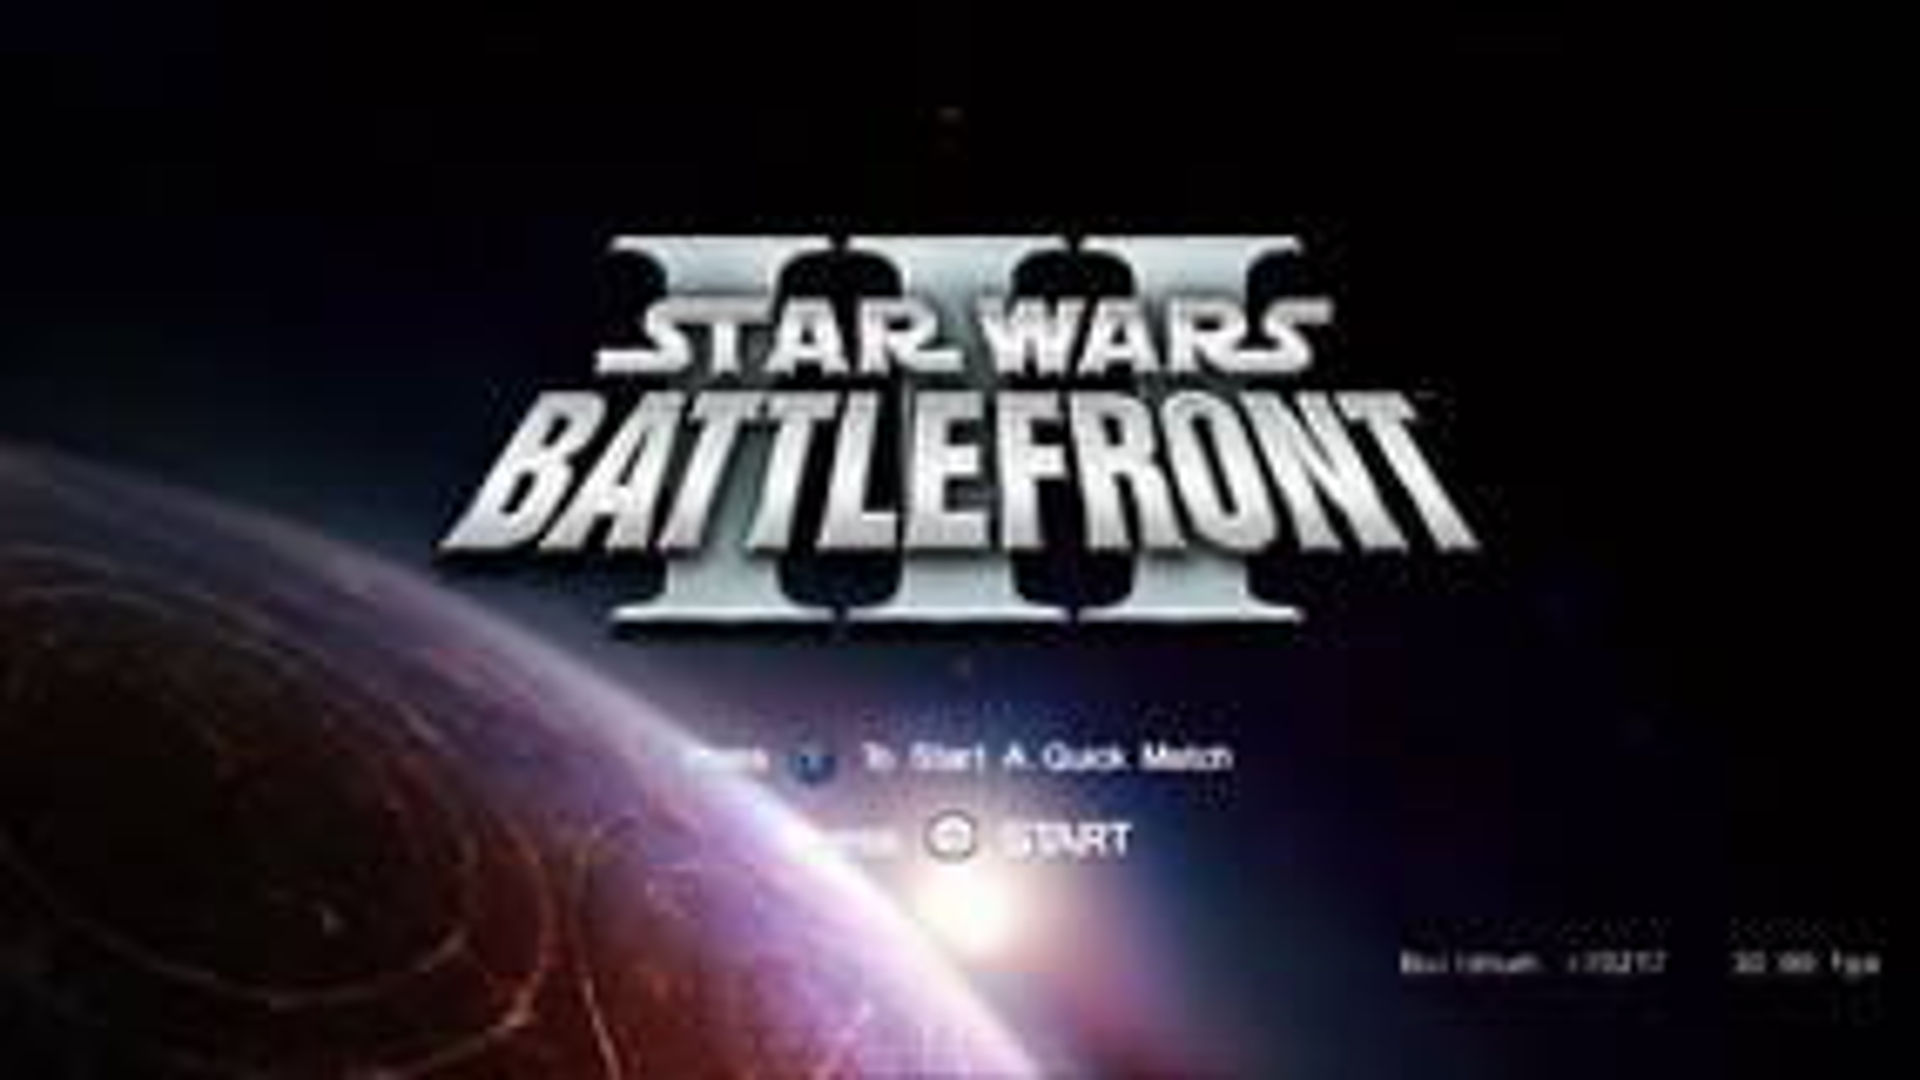 Image for Star Wars Battlefront 3 footage emerges from apparent leak